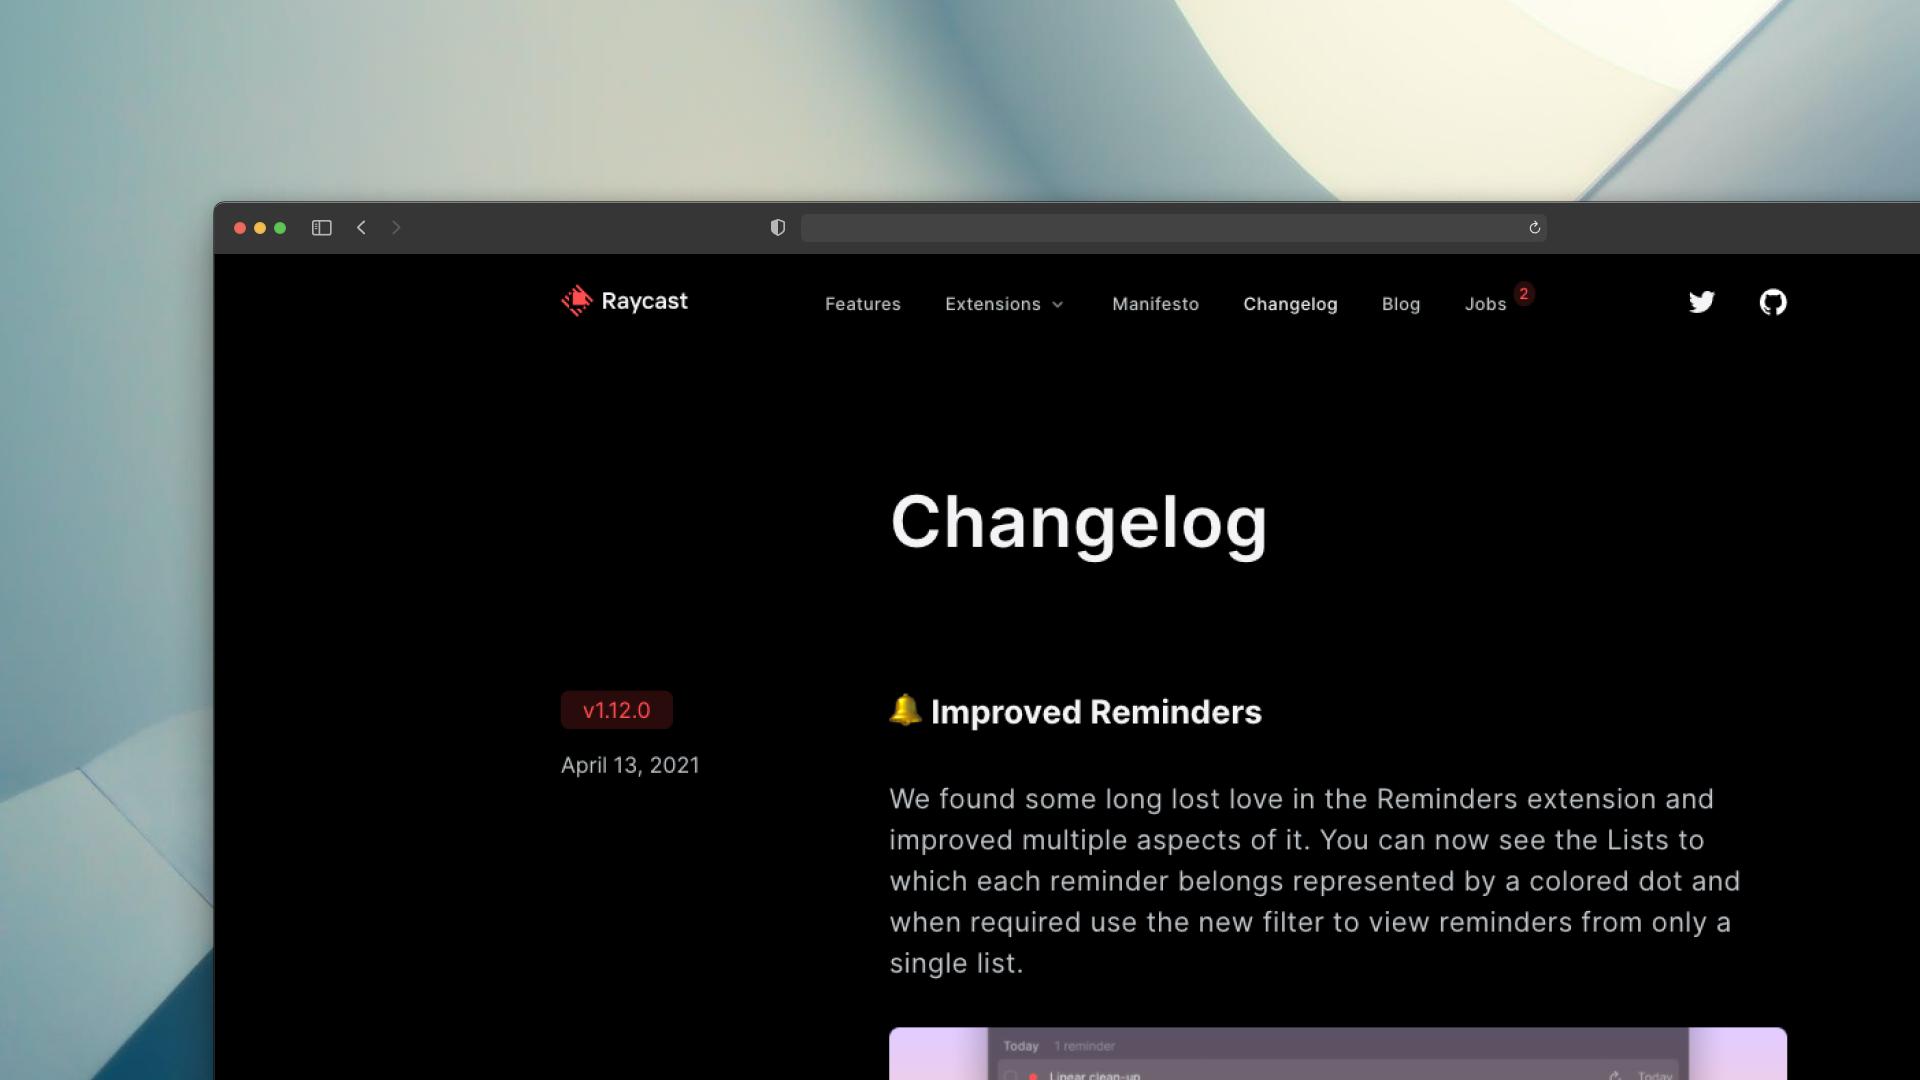 Raycast Changelog Screenshot